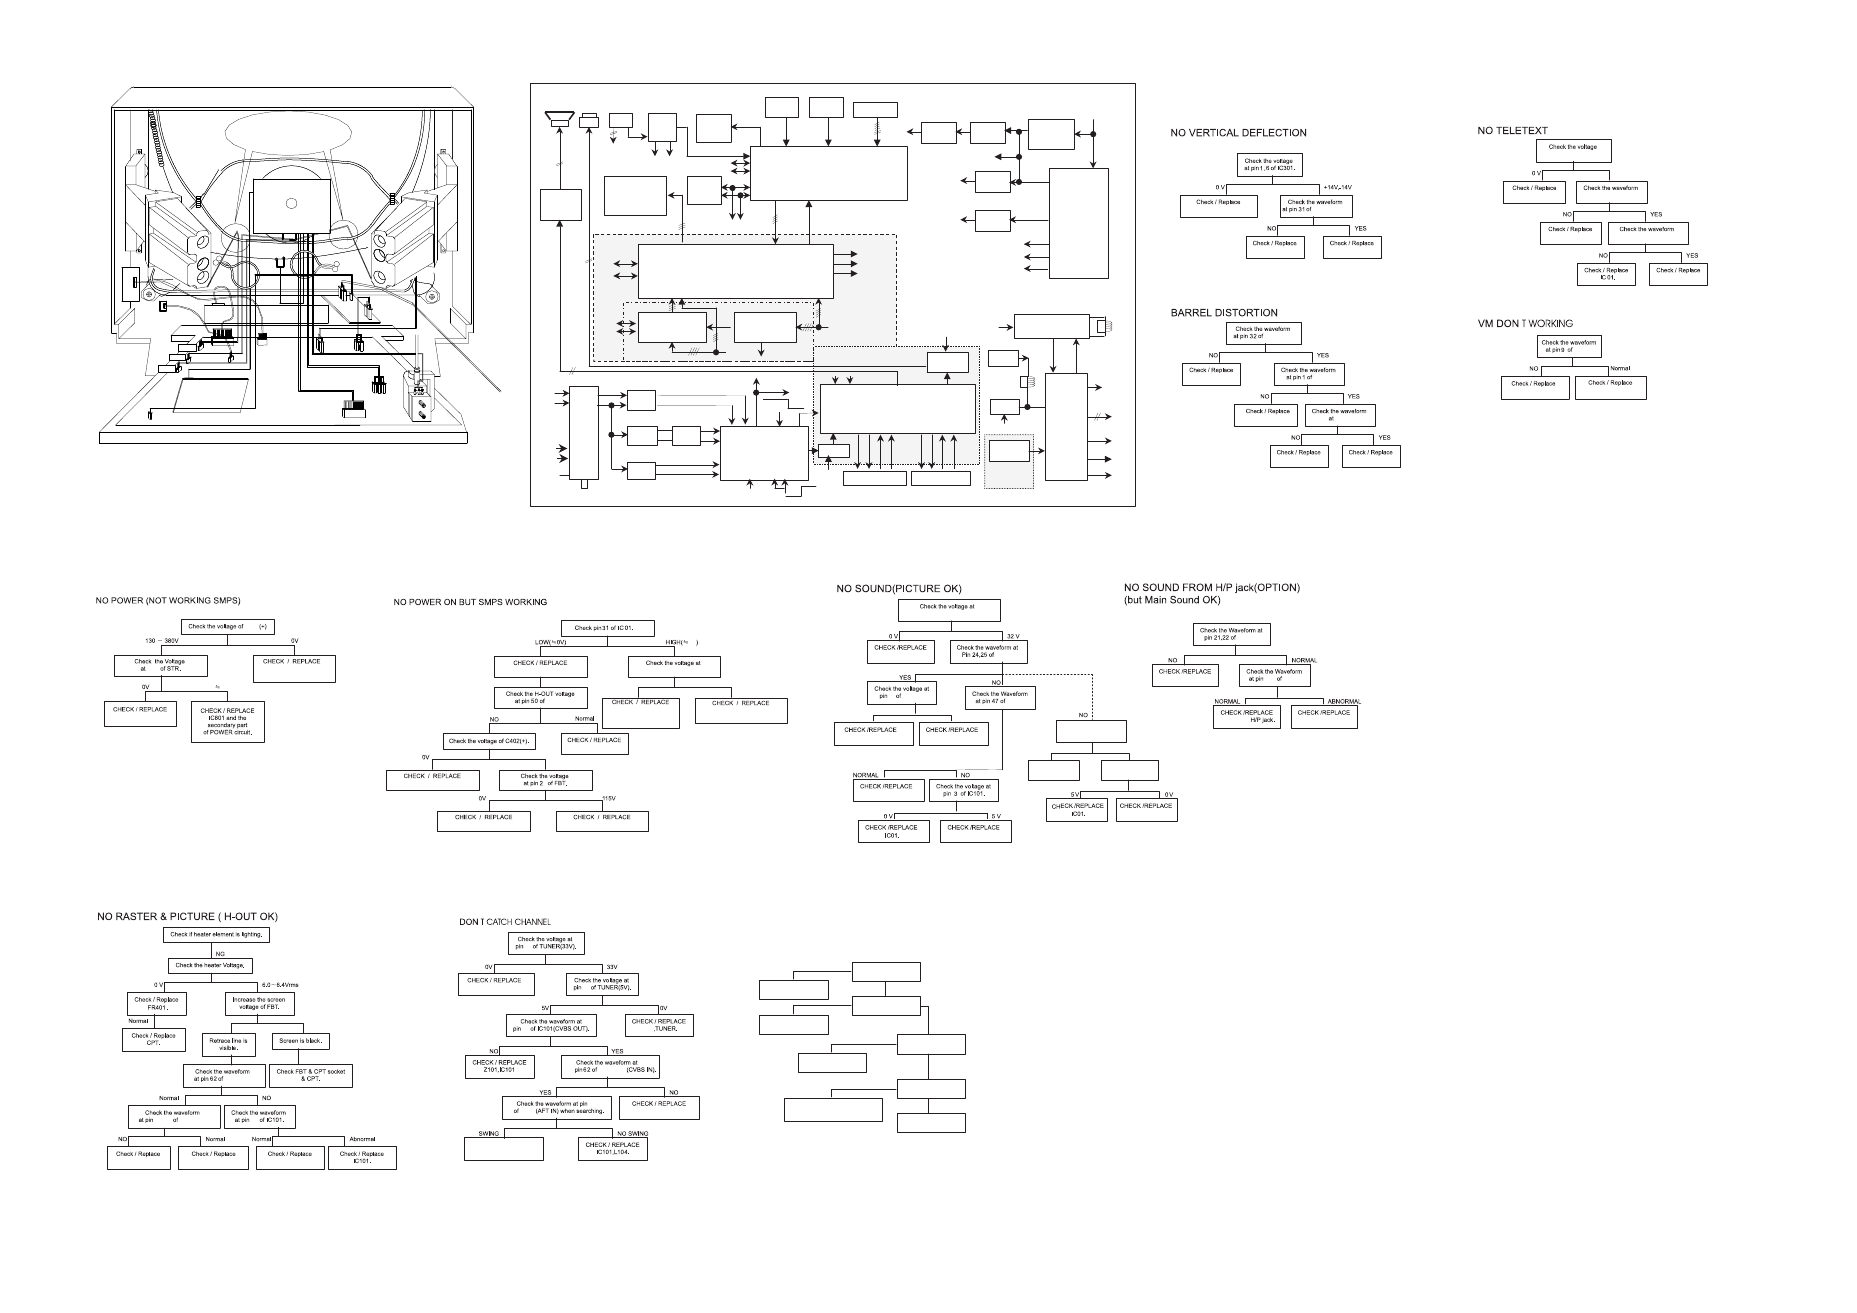 Wiring Diagram  Block Diagram Troubleshooting Guide